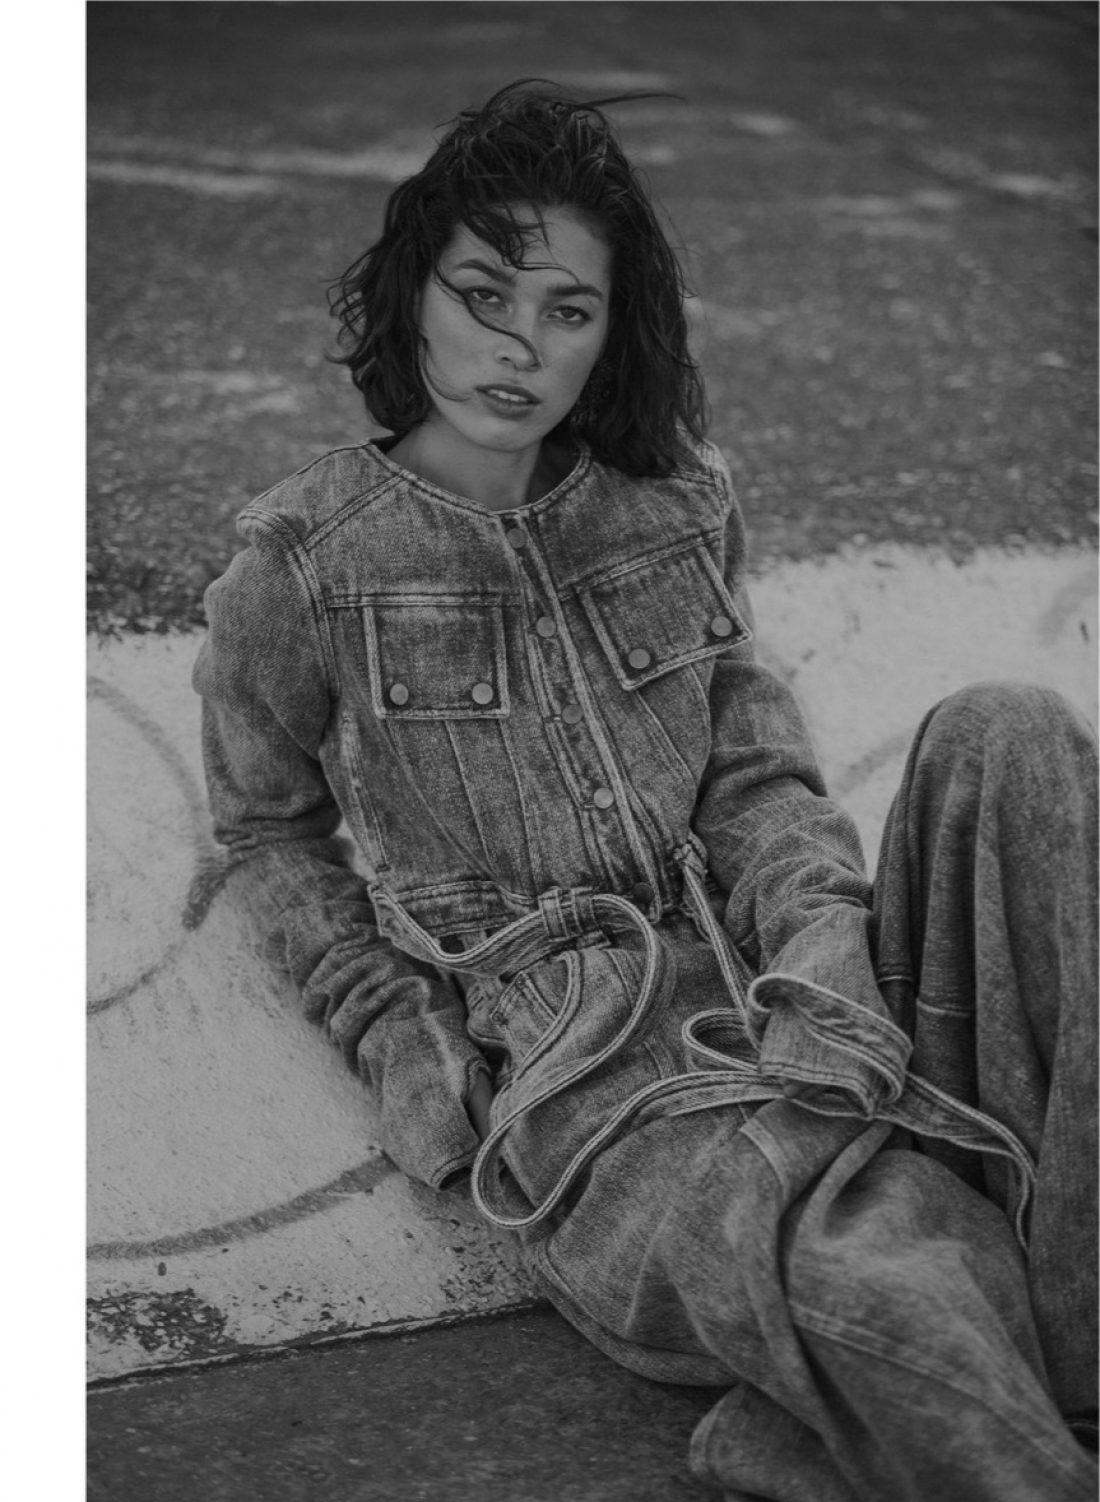 Sian photographed by Natasha Killeen for Page One Magazine